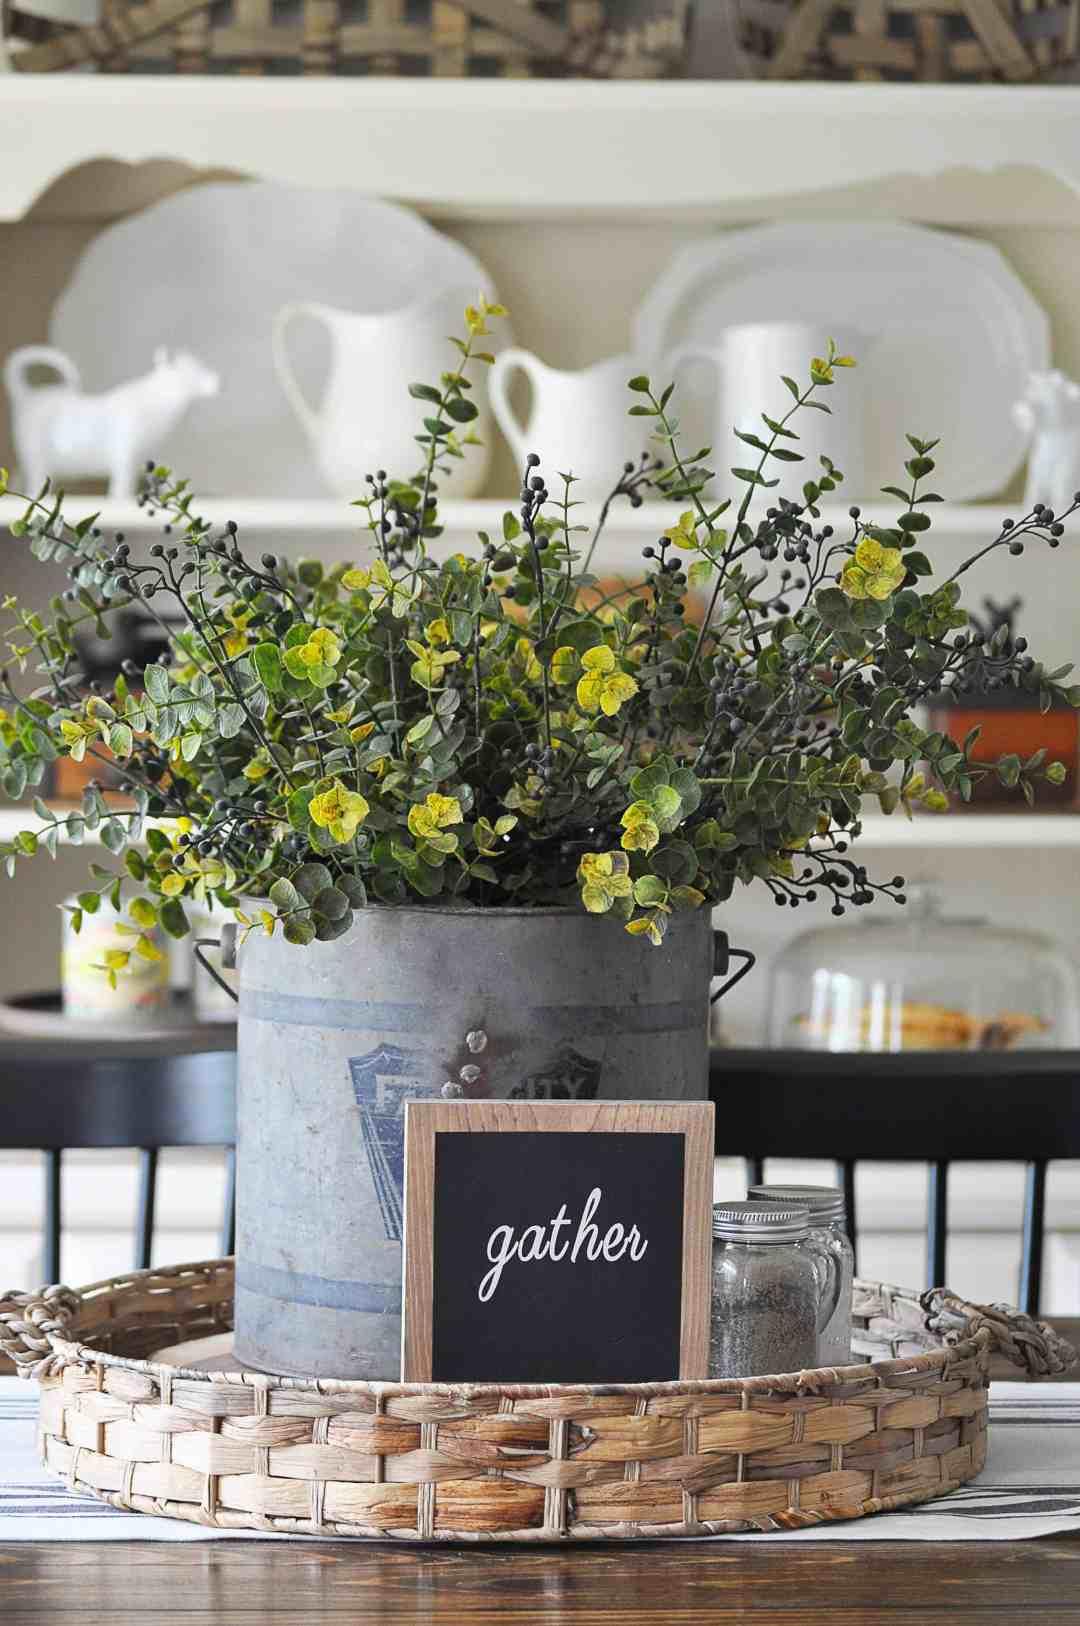 Gable Lane Crates - Sow & Gather via Littles Glass Jar